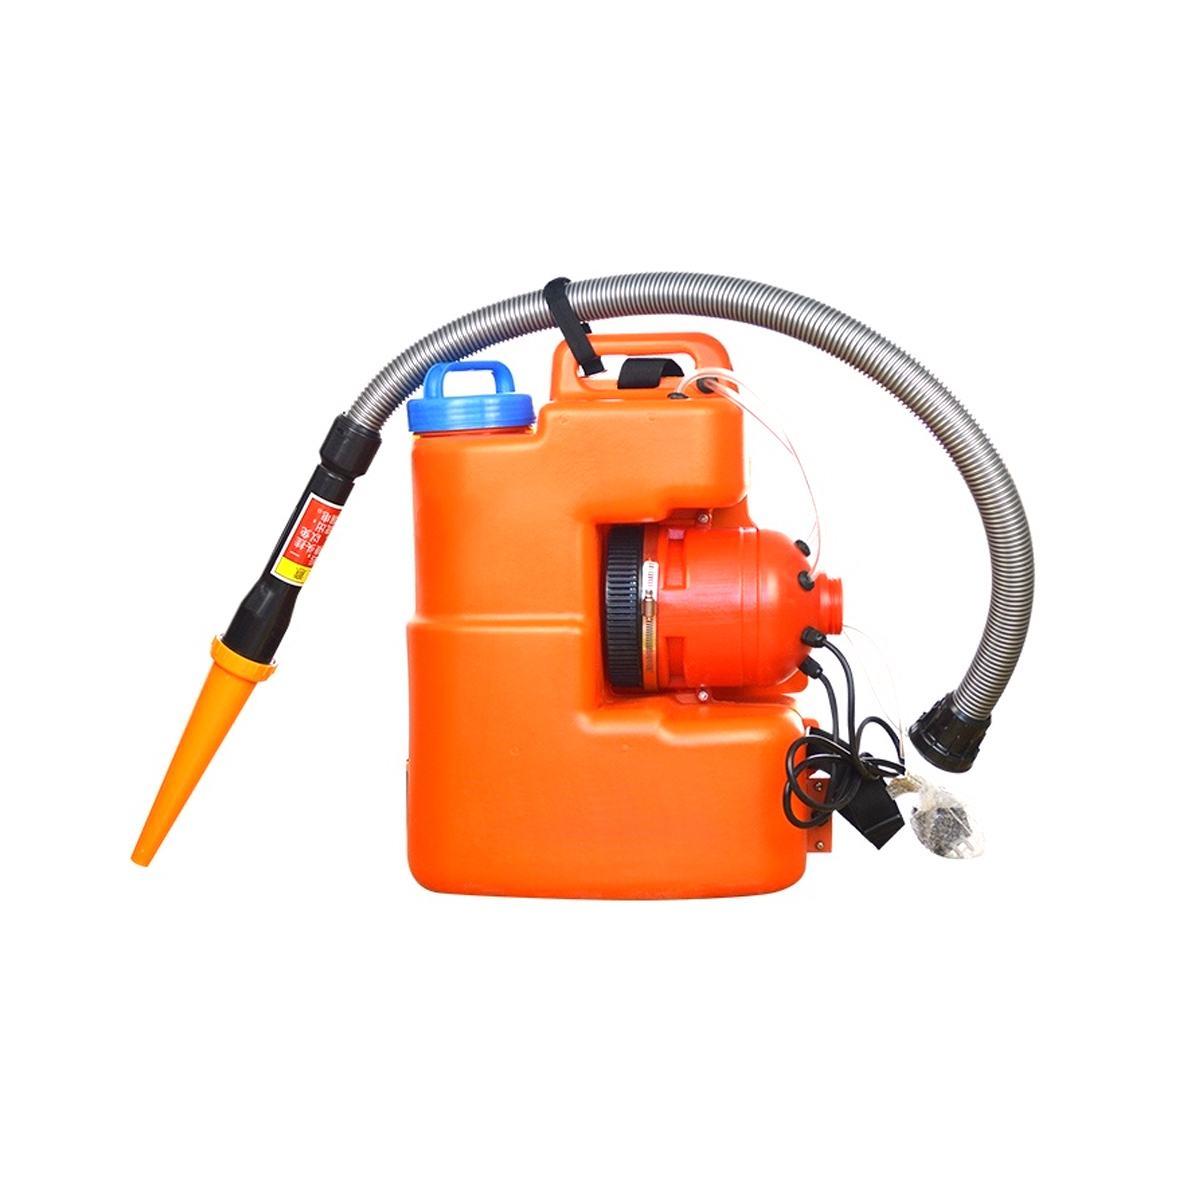 Industrial 220V 20L Electric Fogger ULV Sprayer Mosquito Killer For Farming Office